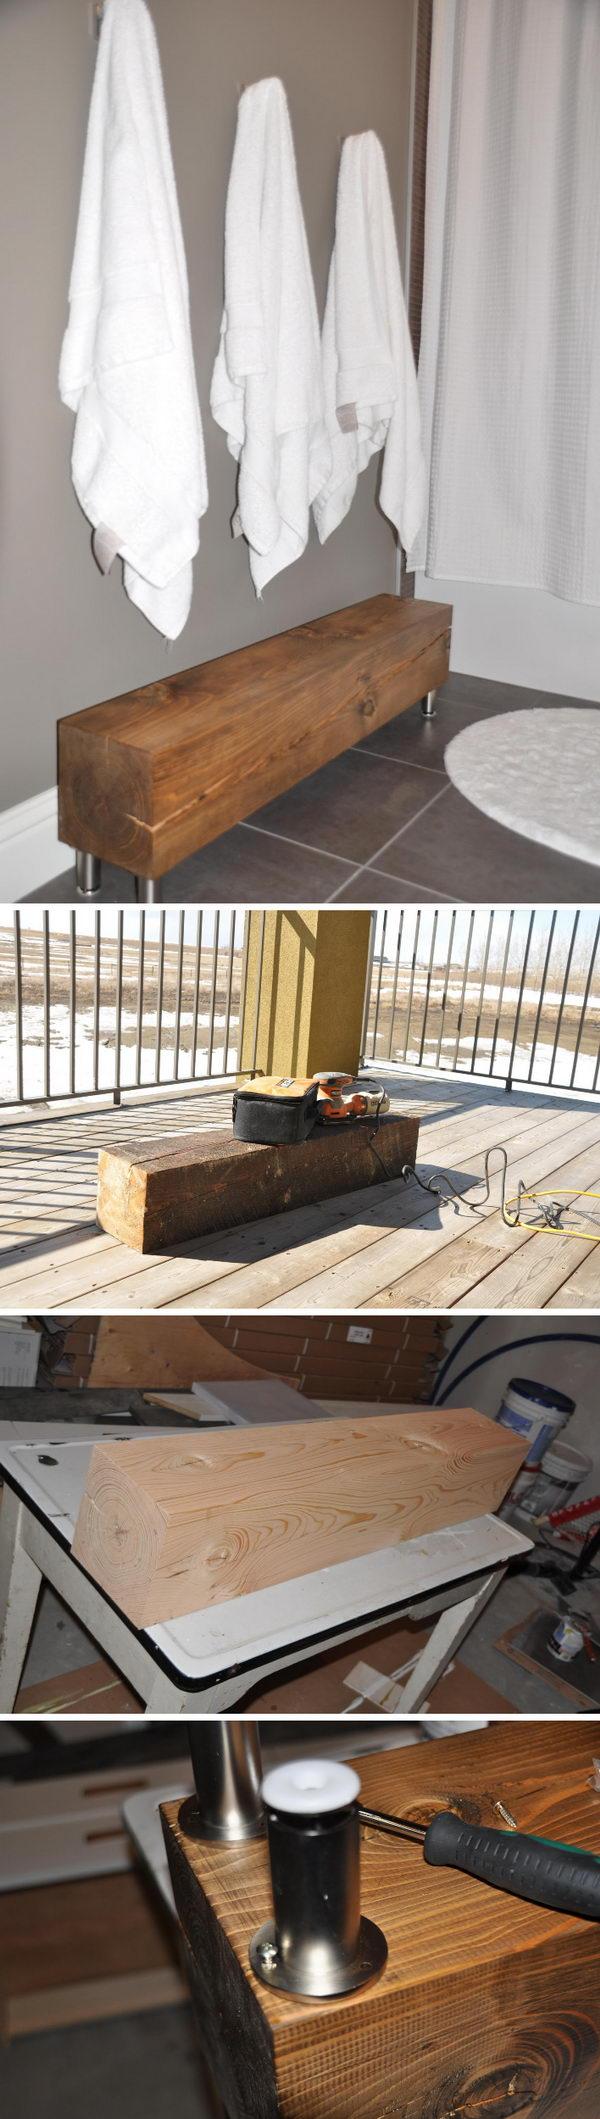 Rustic Modern Bench.